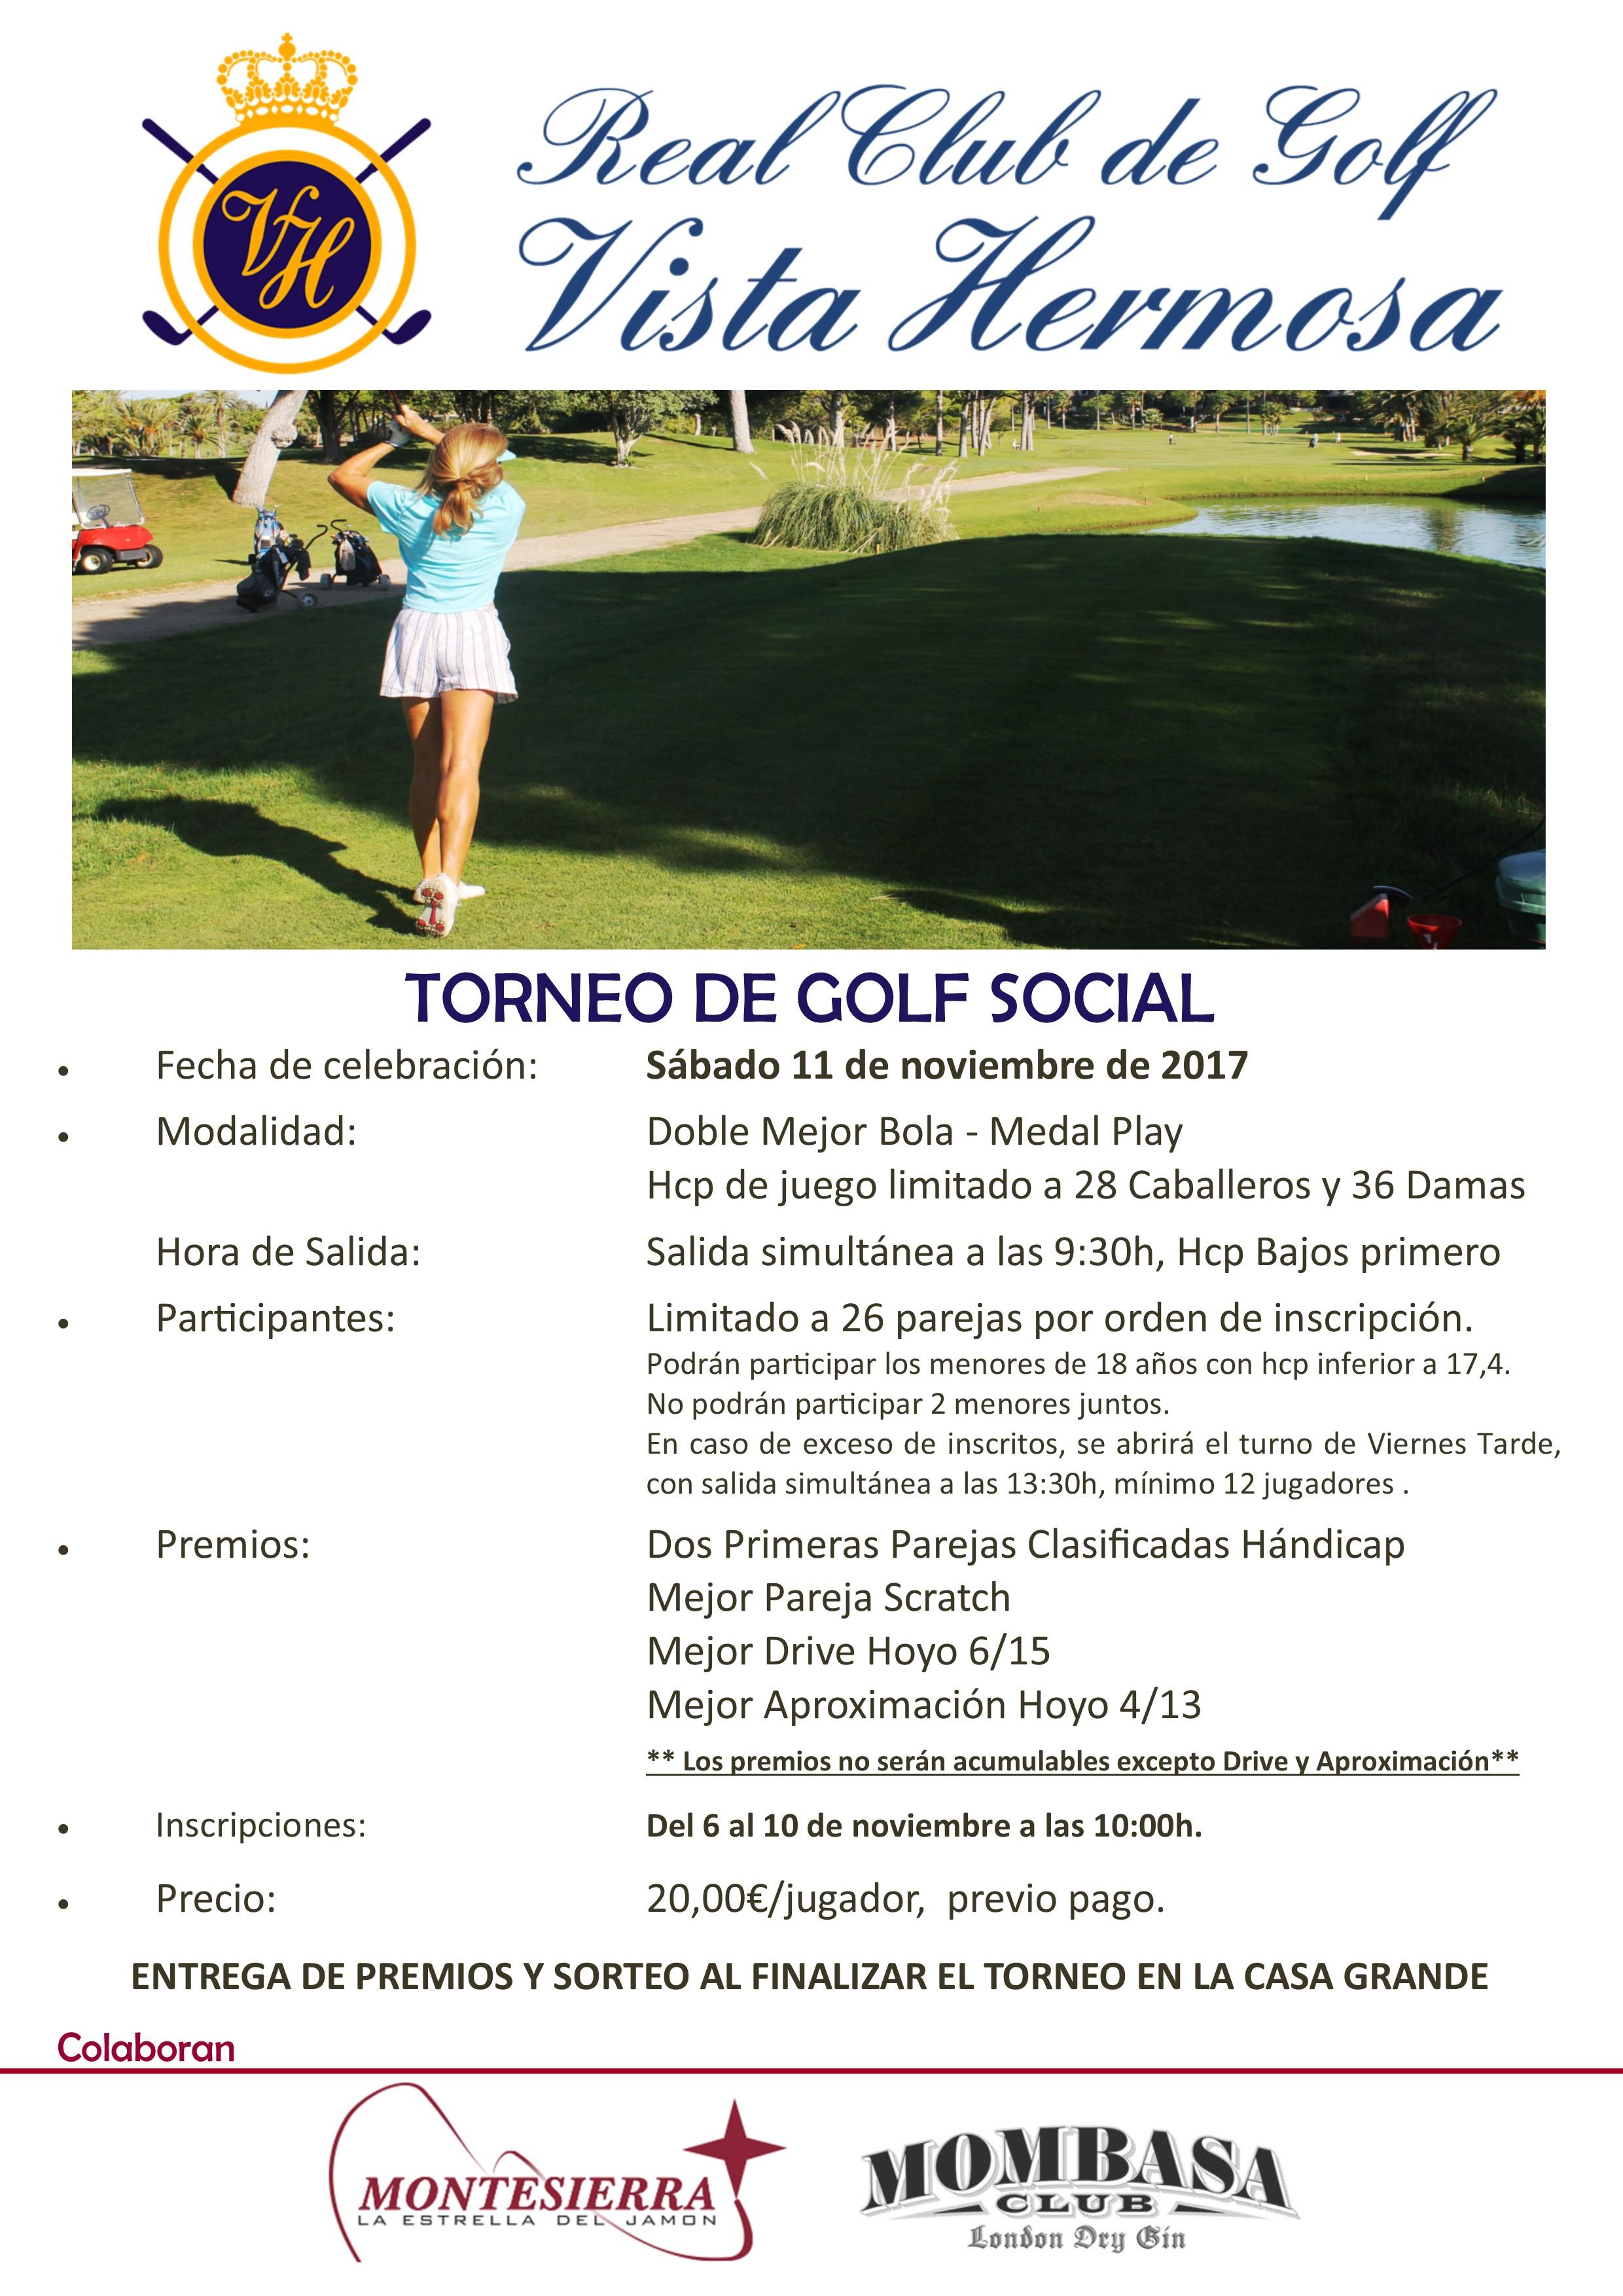 Torneo Montesierra en Vistahermosa